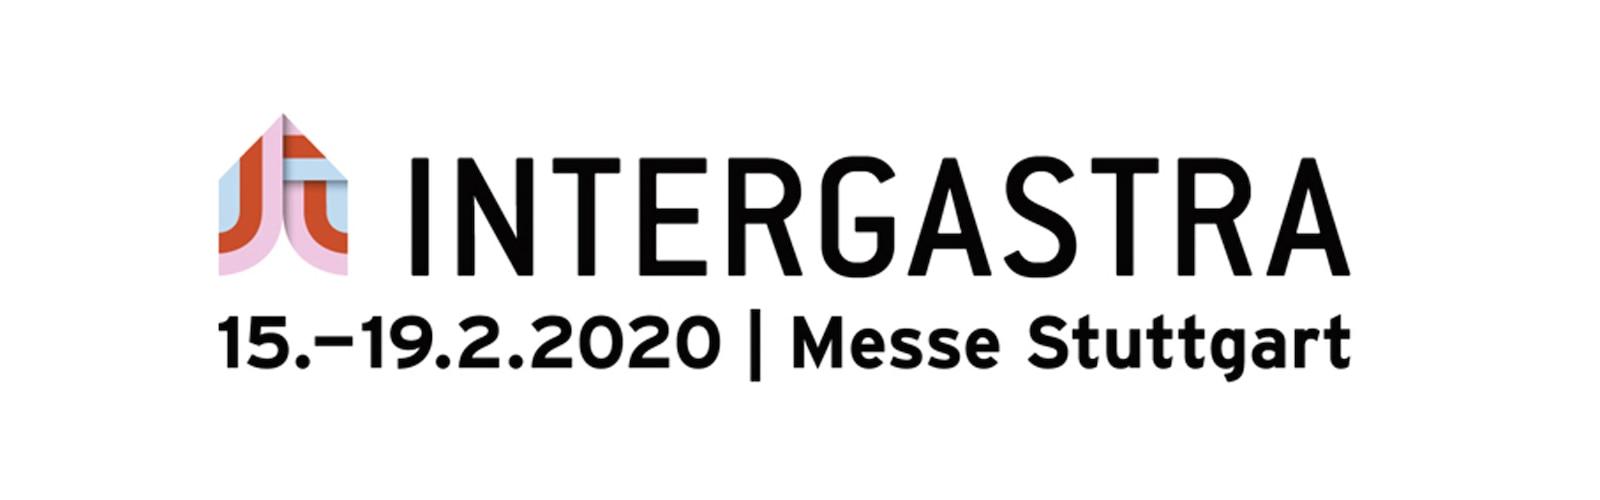 intergastra-original-new.jpg